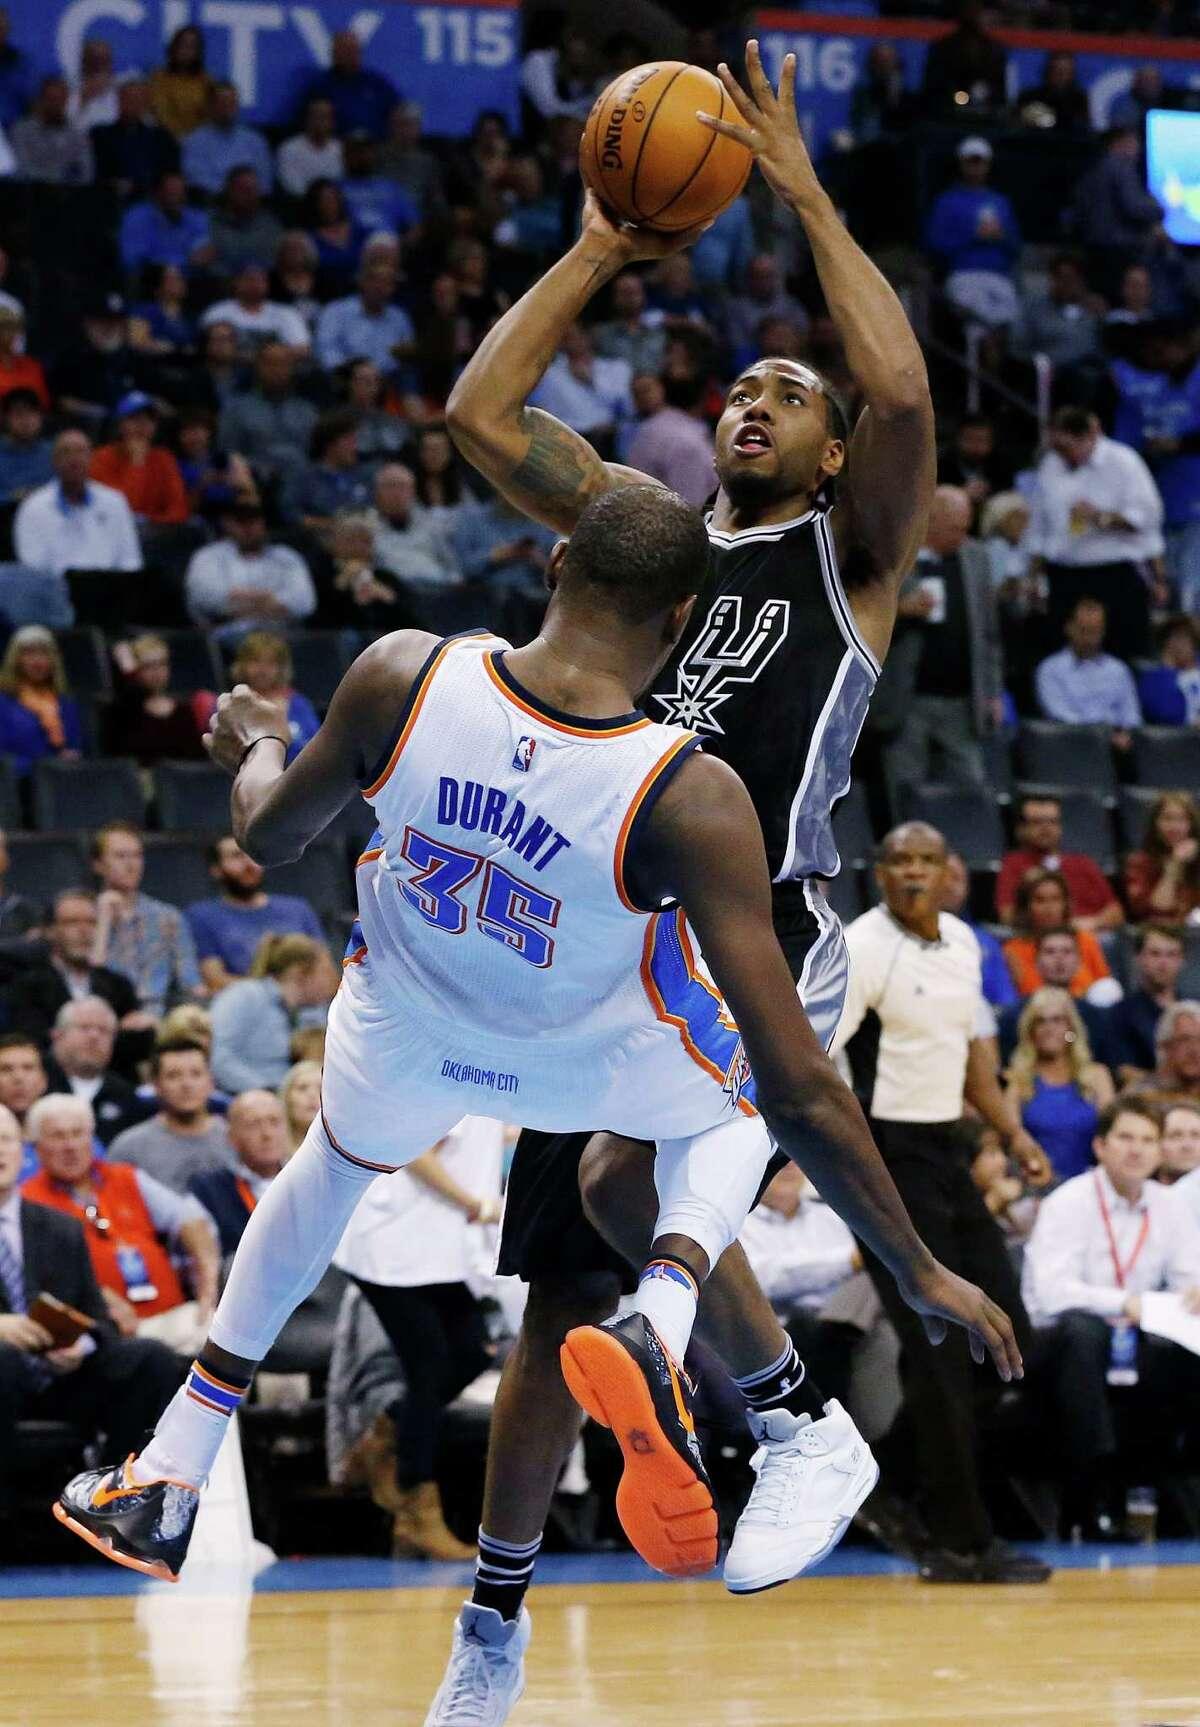 Spurs forward Kawhi Leonard is fouled by Oklahoma City Thunder forward Kevin Durant while shooting in the third quarter on Oct. 28, 2015. Oklahoma City won 112-106.